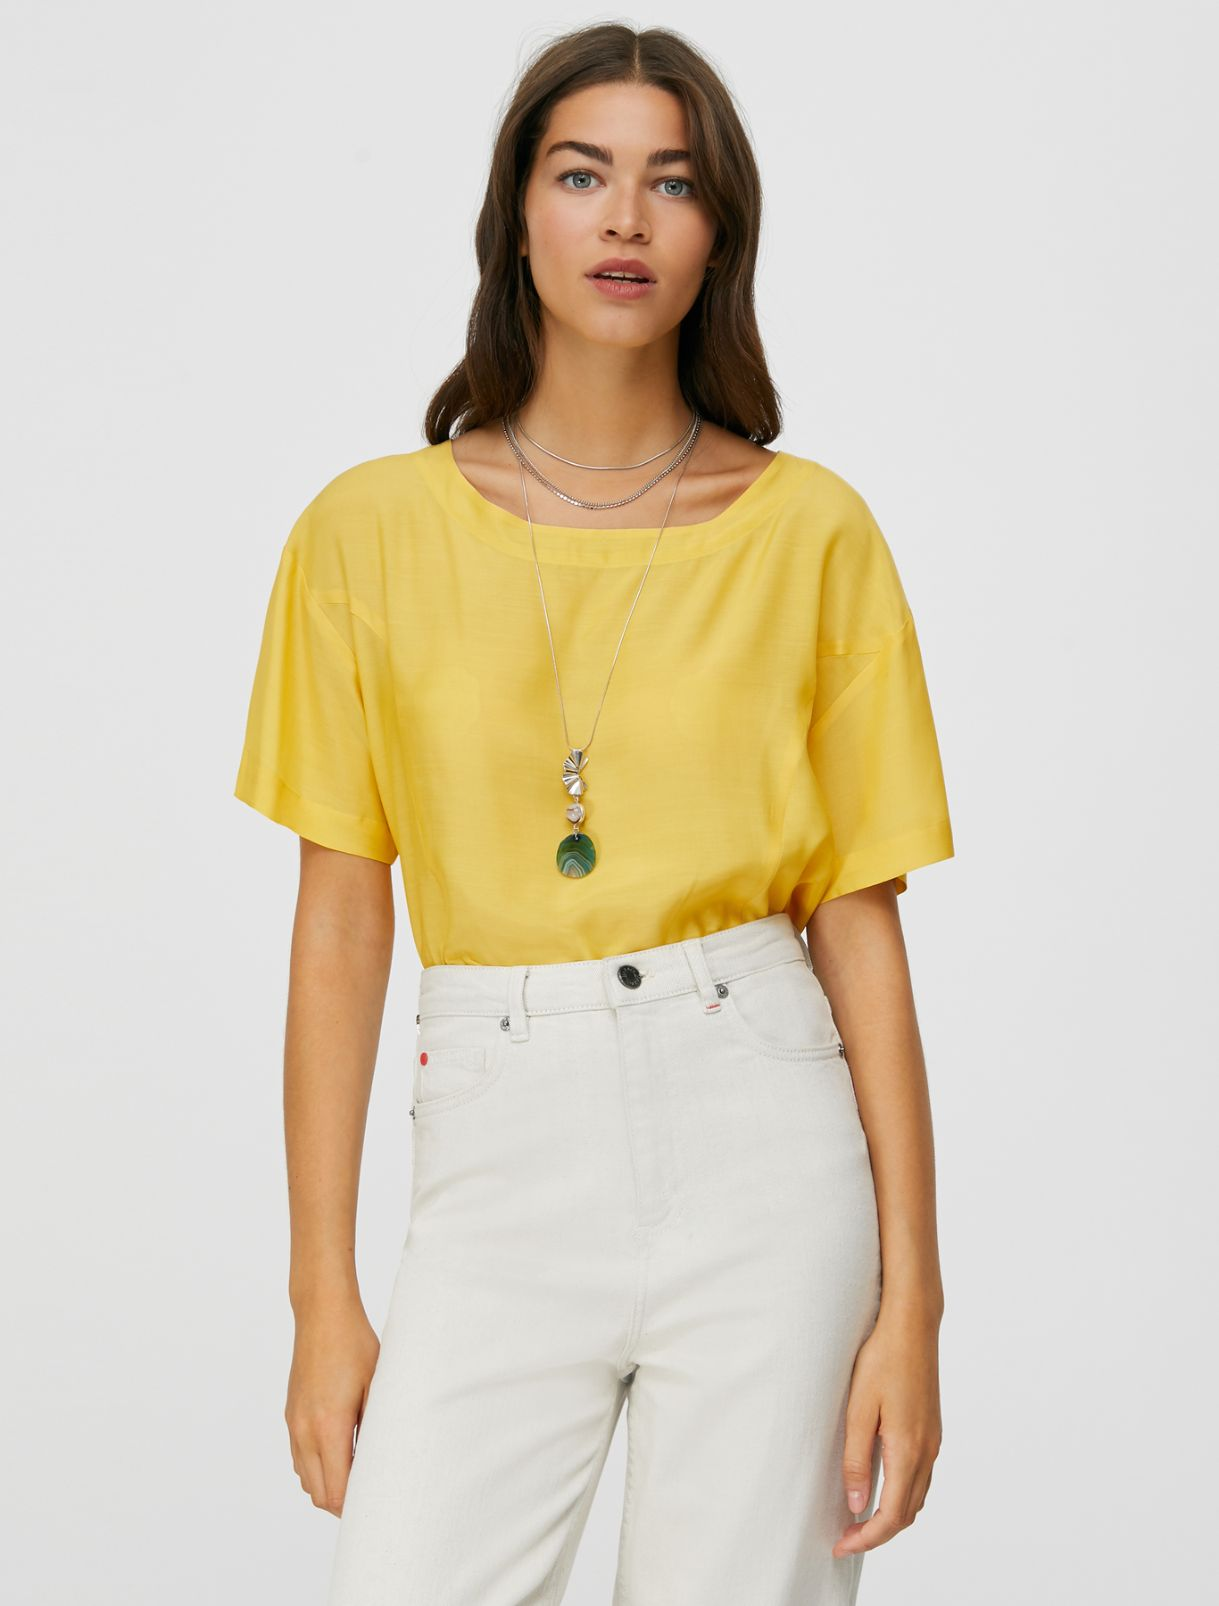 DISPENSA Shirt sunshine yellow 1